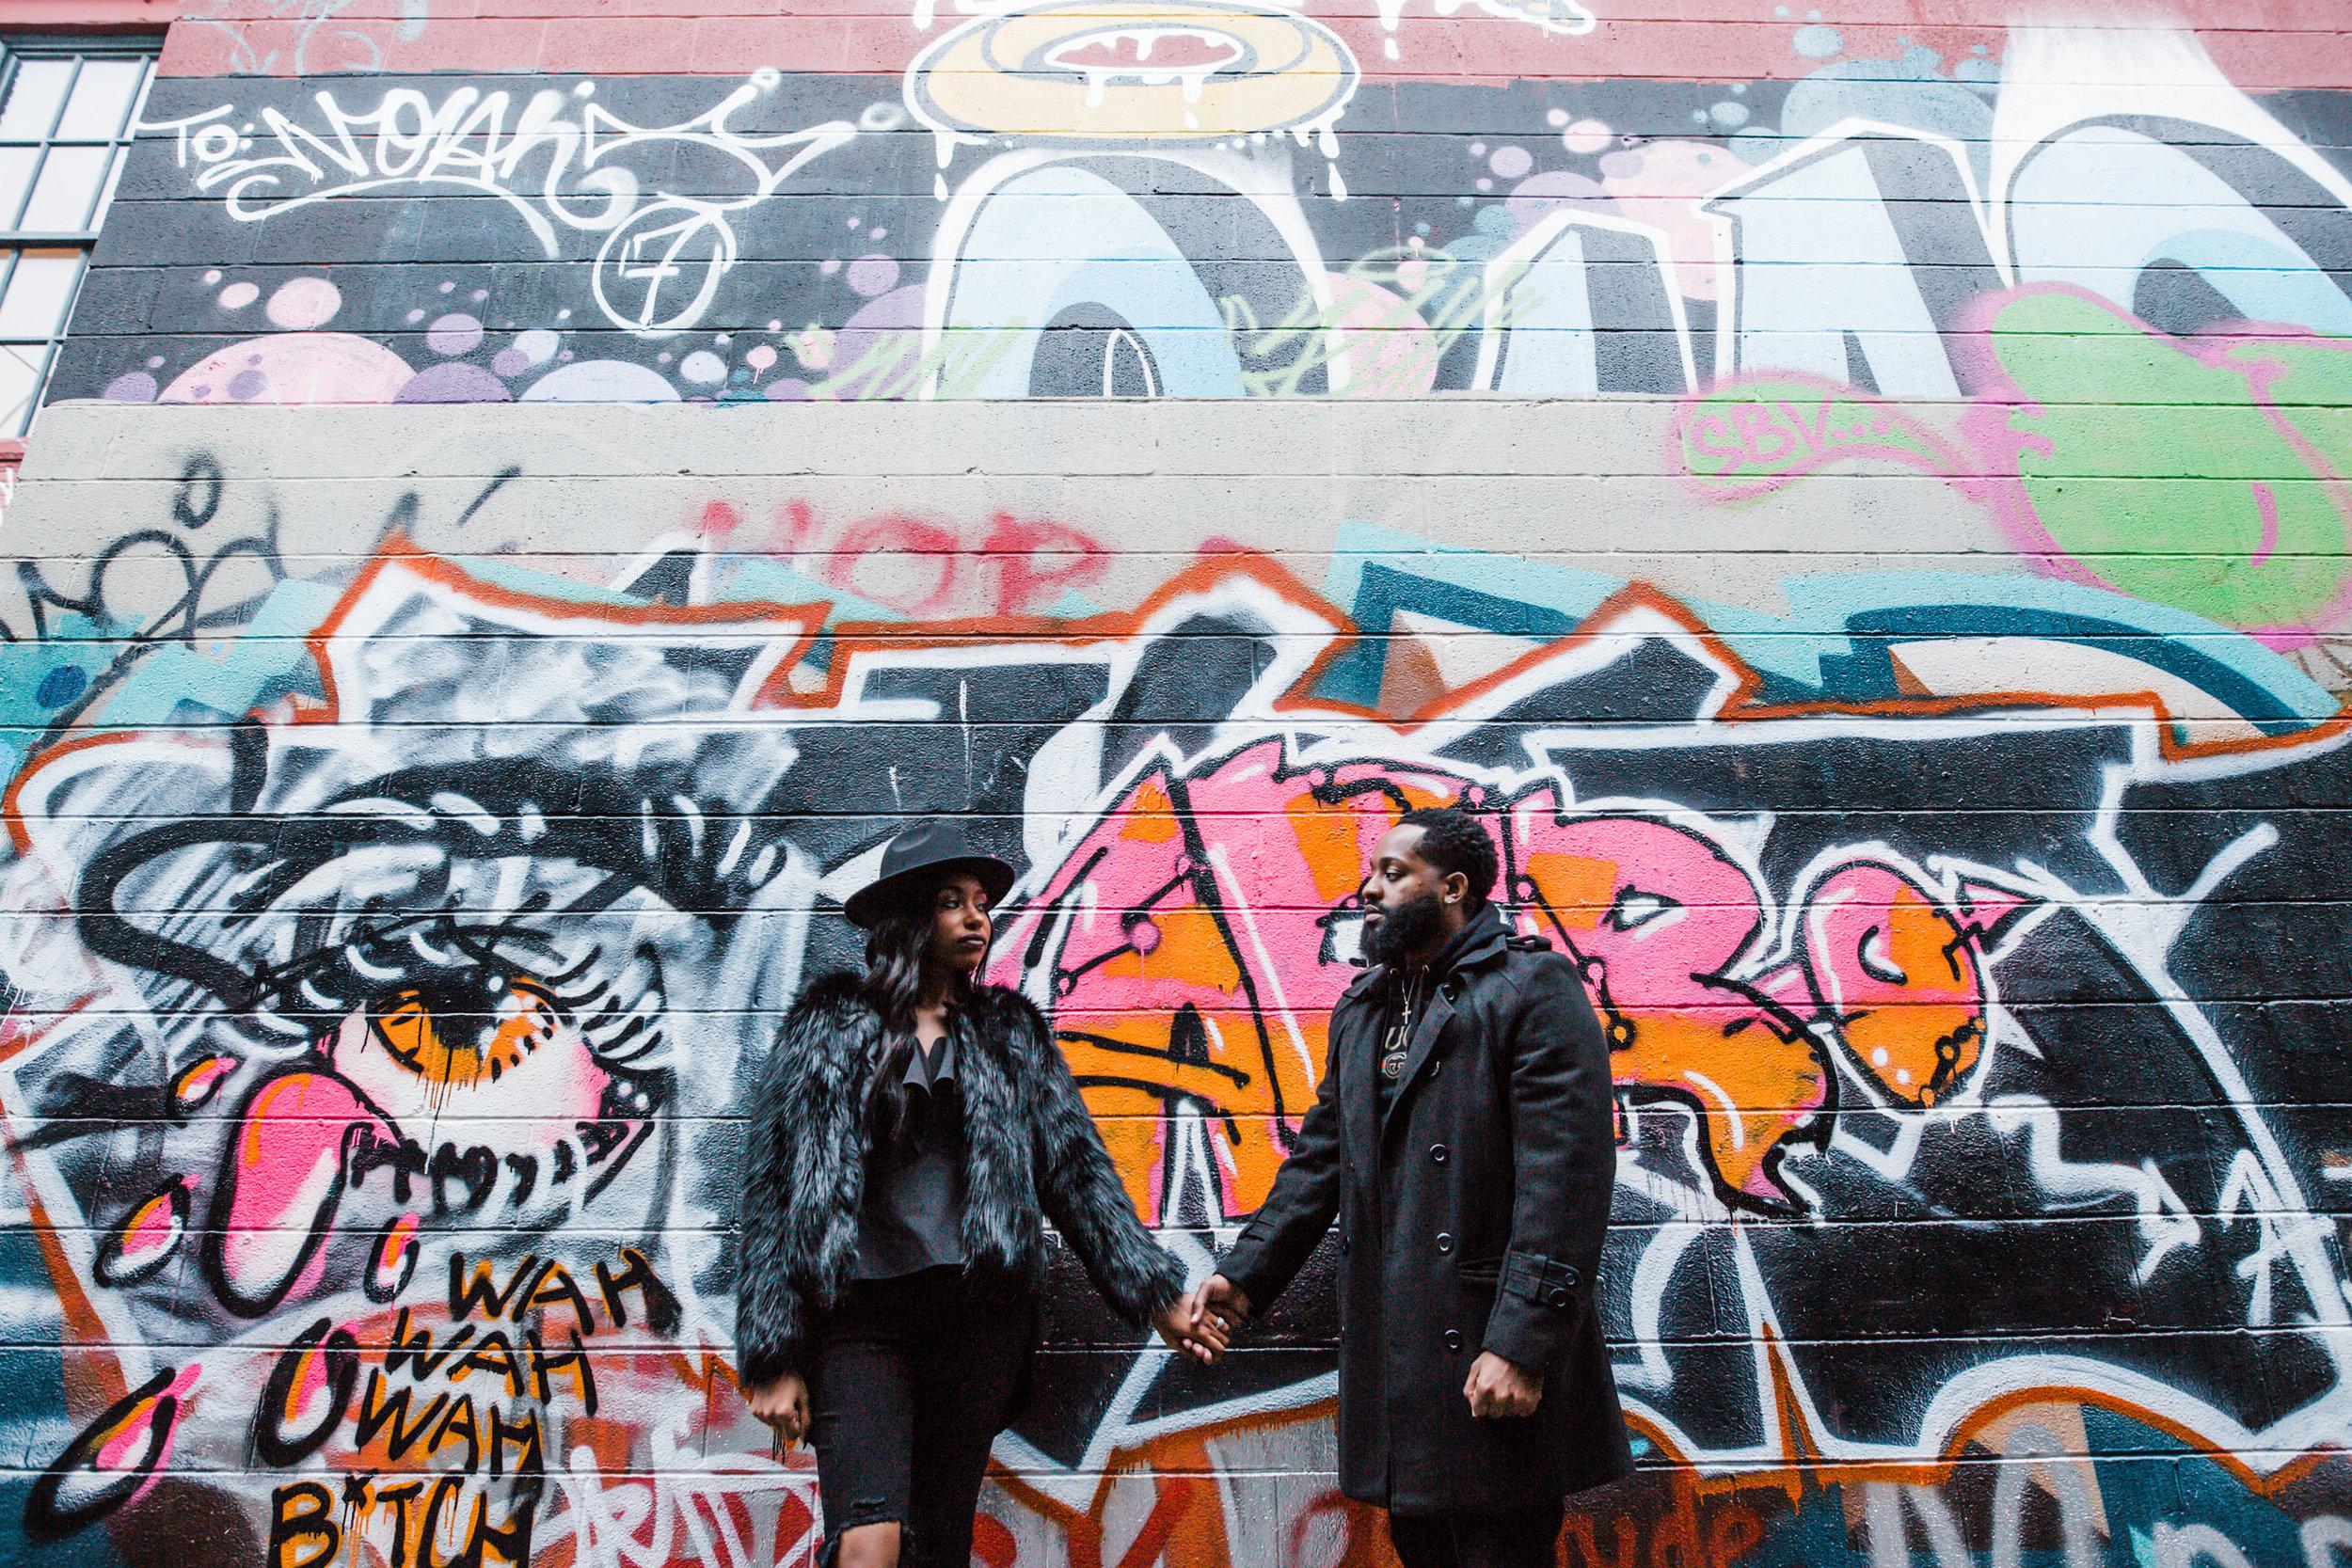 Creative Baltimore Graffiti Alley Engagement Session Megapixels Media Photography-44.jpg